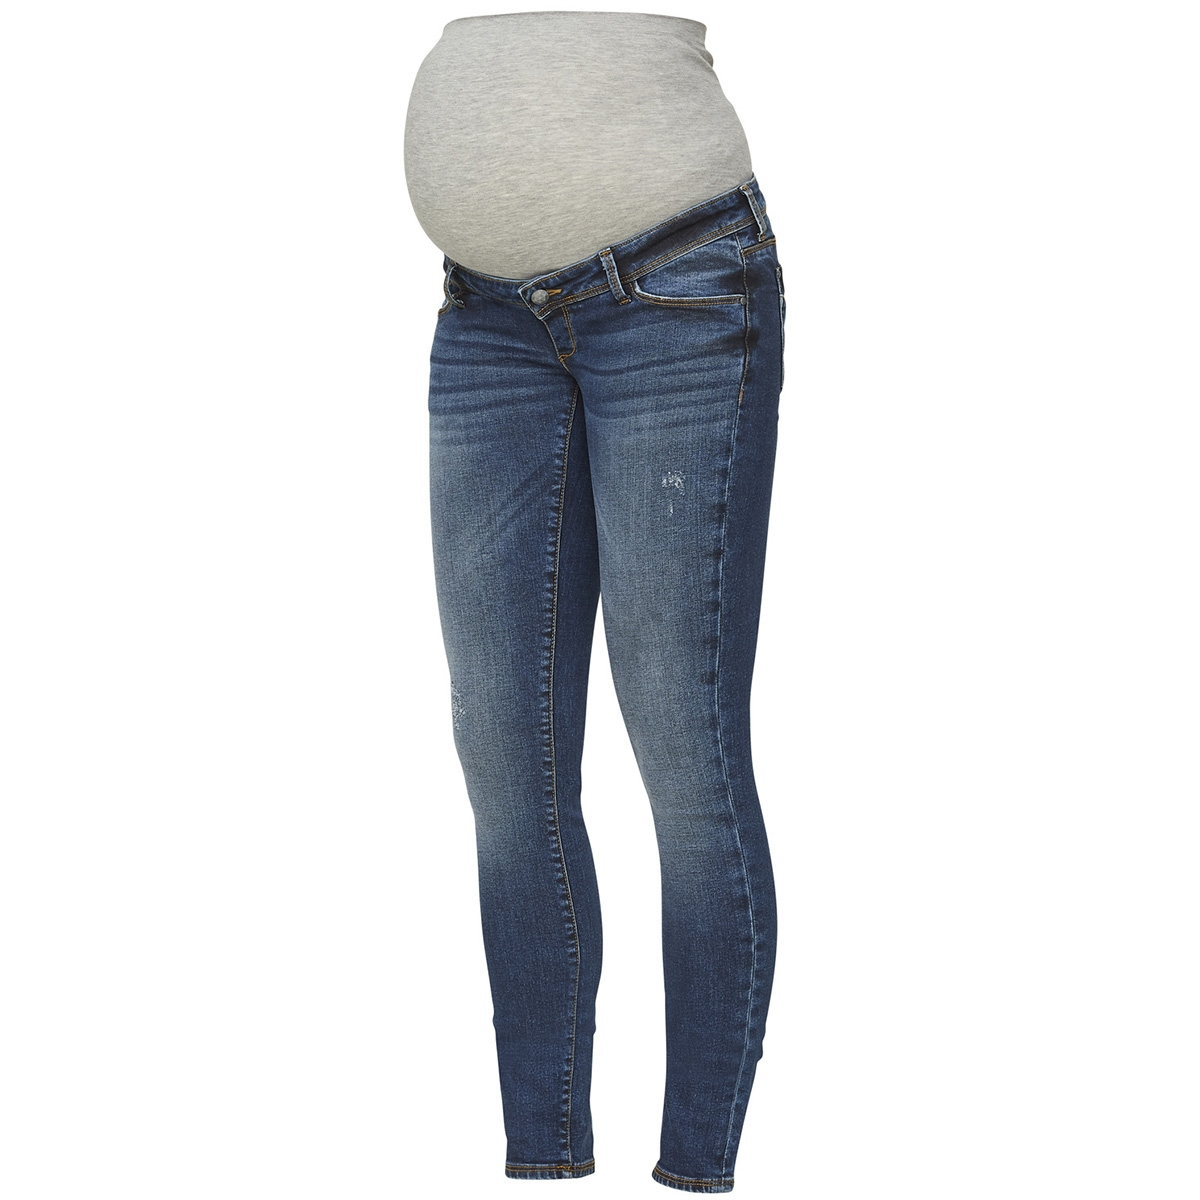 mlohio slim blue jeans 20009315 mama-licious positie broek blue denim